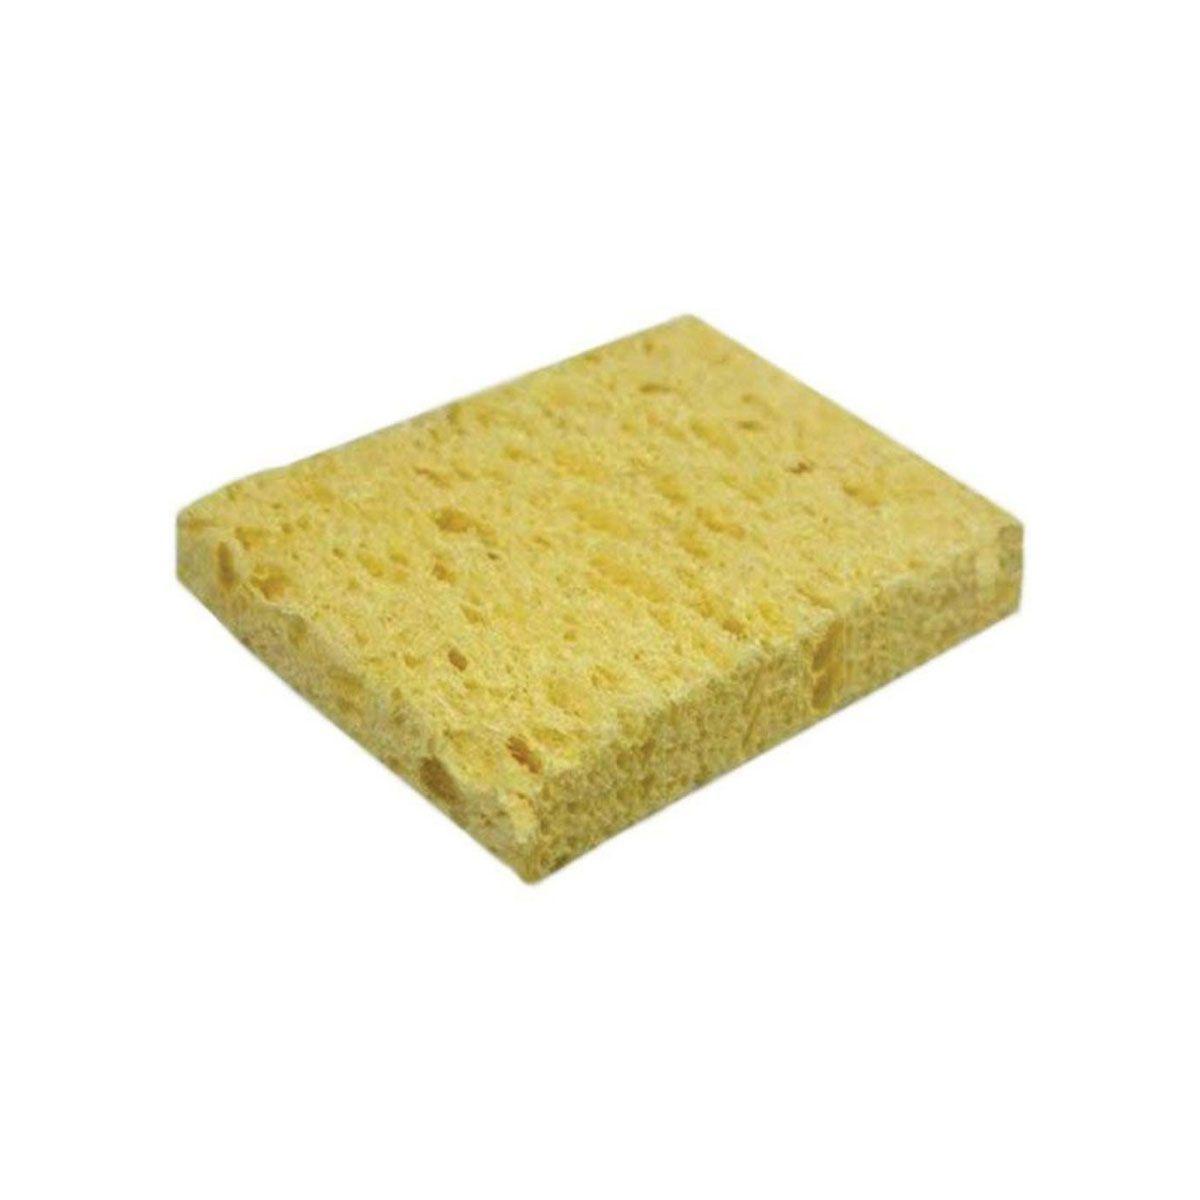 4x Esponja Vegetal para Limpar de ferro de solda - Suetoku